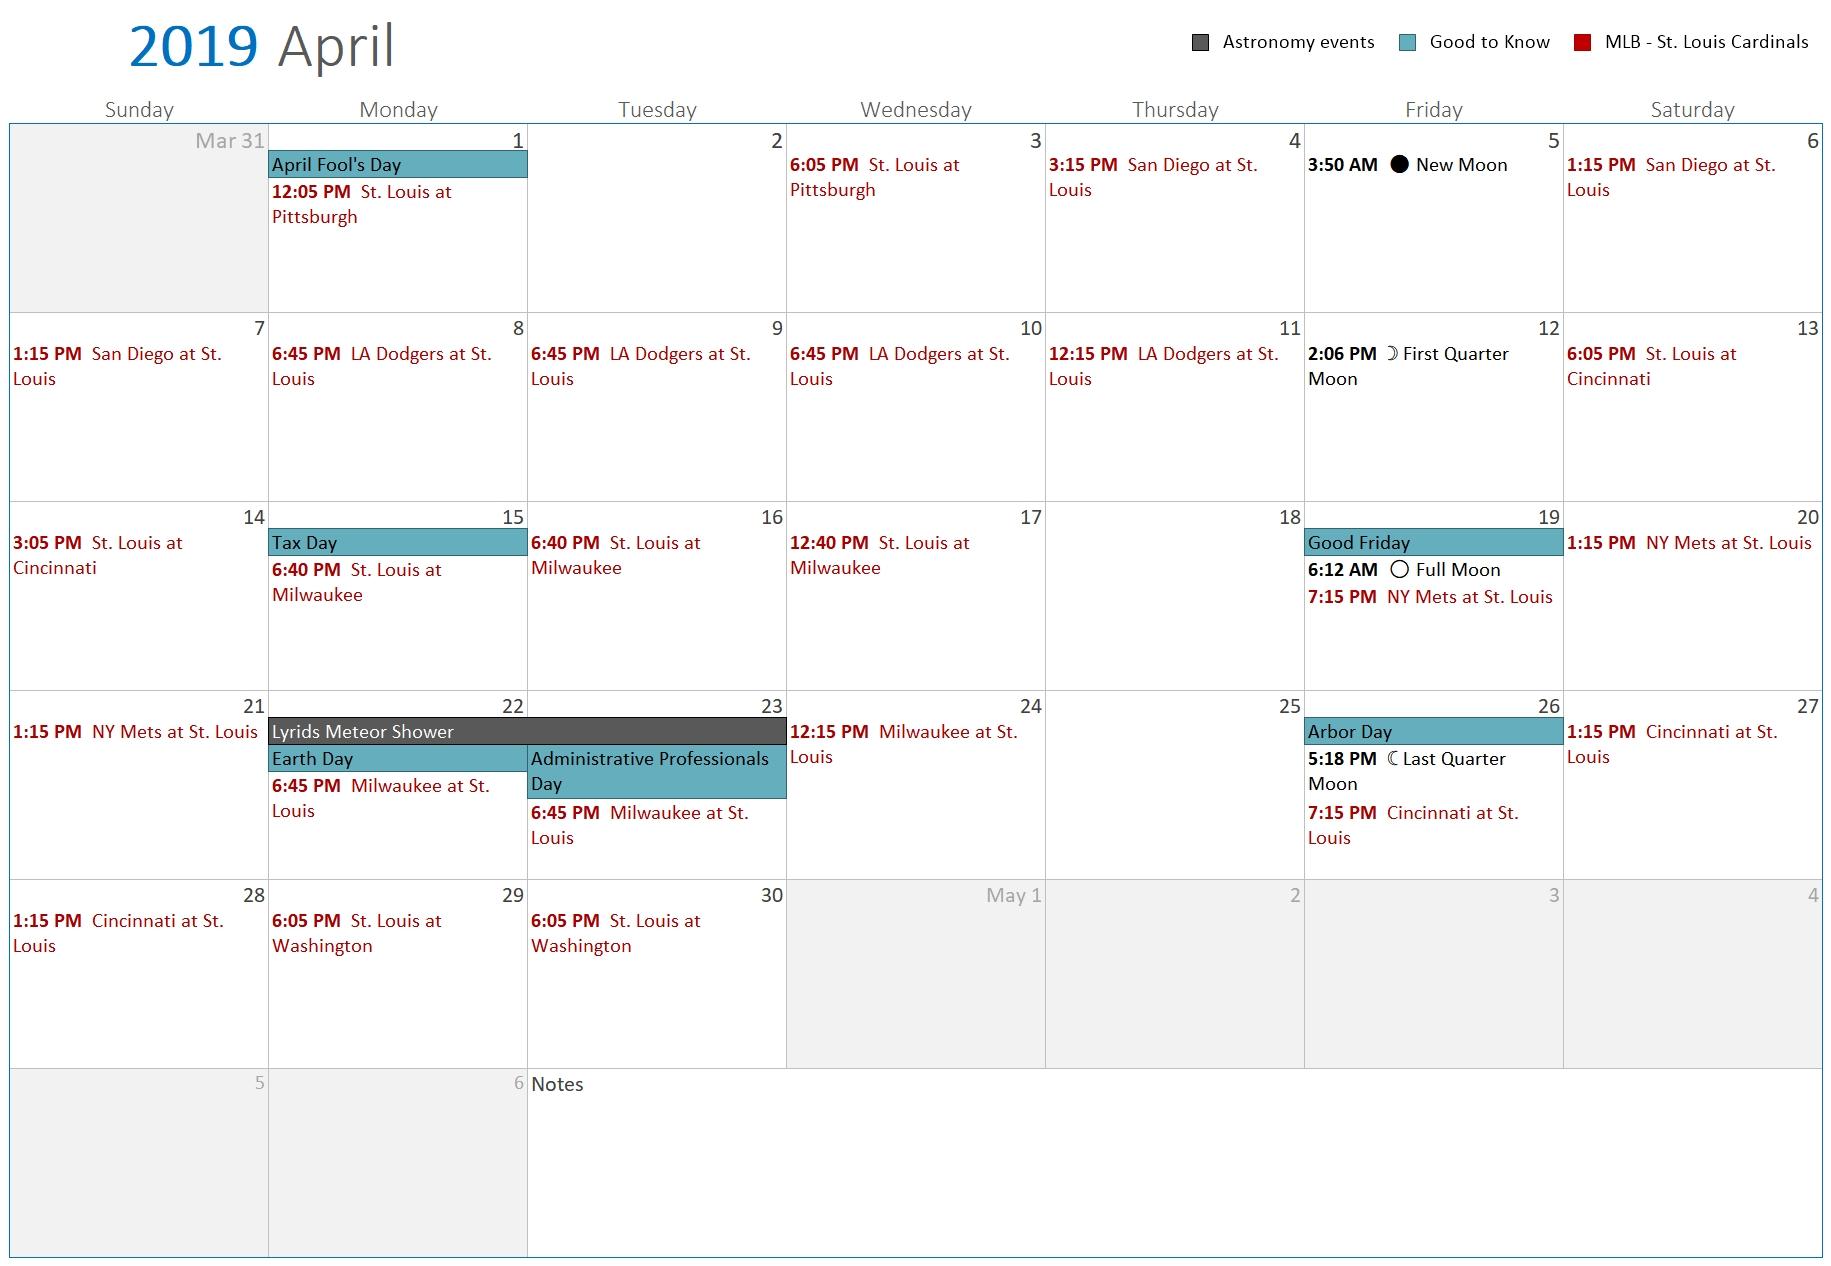 Printablecal | Create Printable Calendars With 90+ Calendar